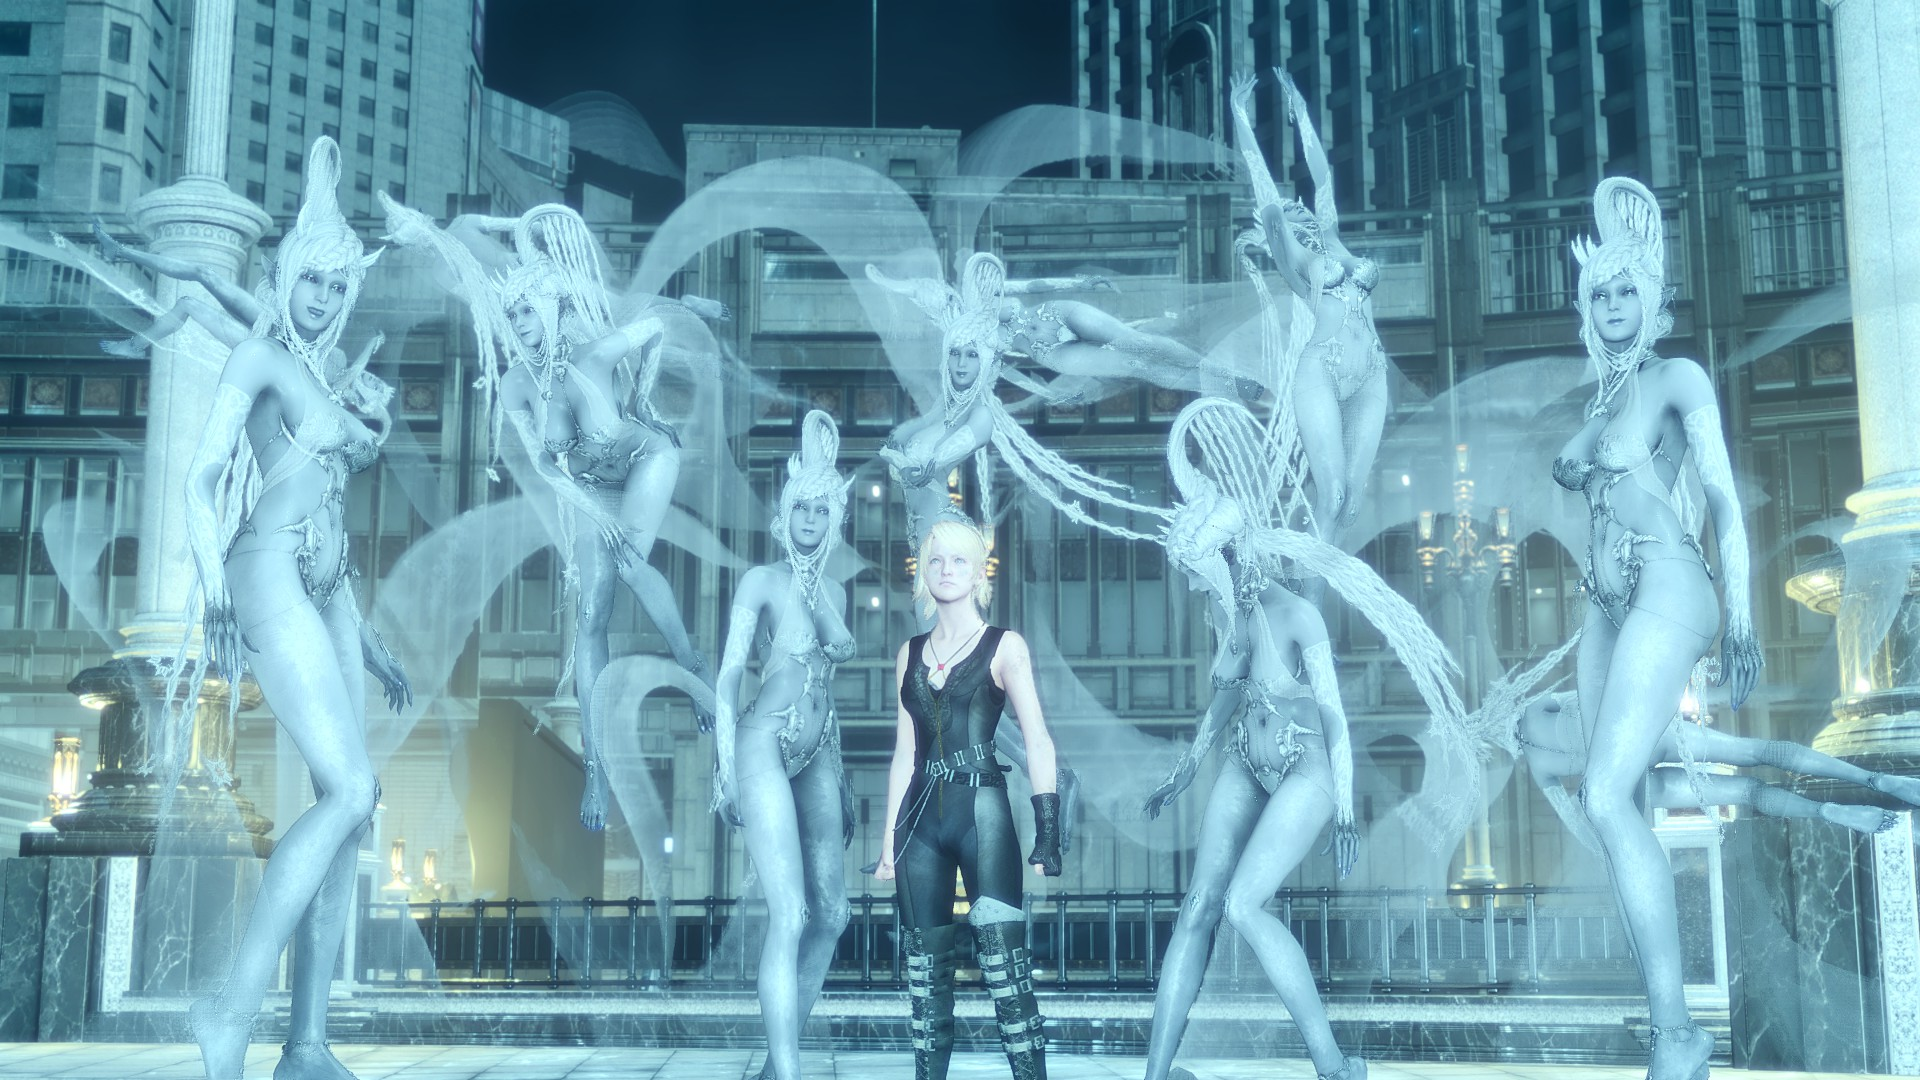 637650_screenshots_20190803170636_1.jpg - Final Fantasy 15